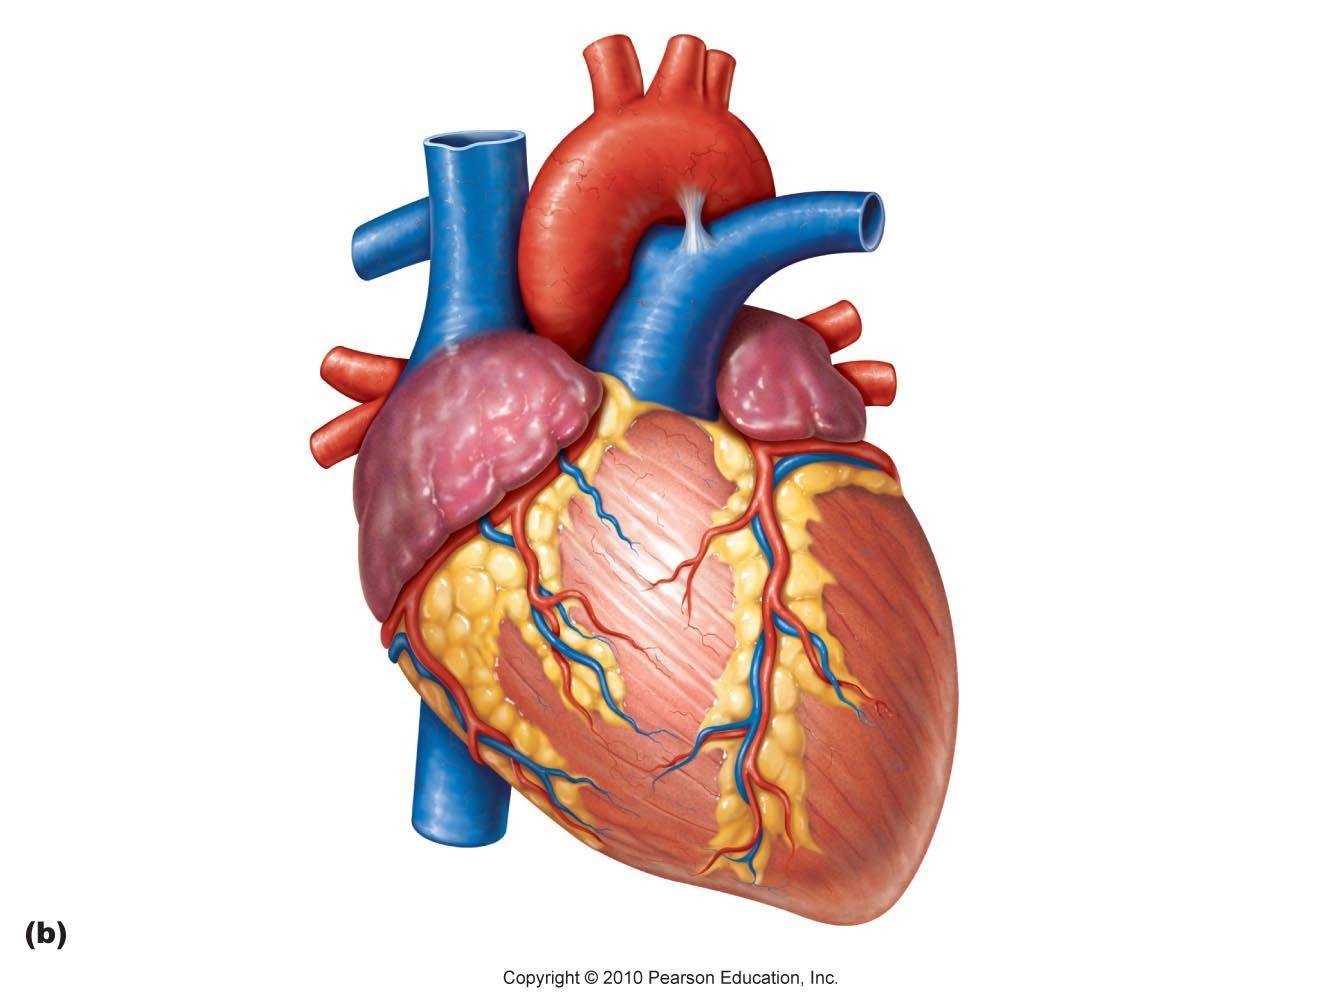 unlabeled heart diagram heart diagram clipart clipart kid [ 1344 x 1008 Pixel ]